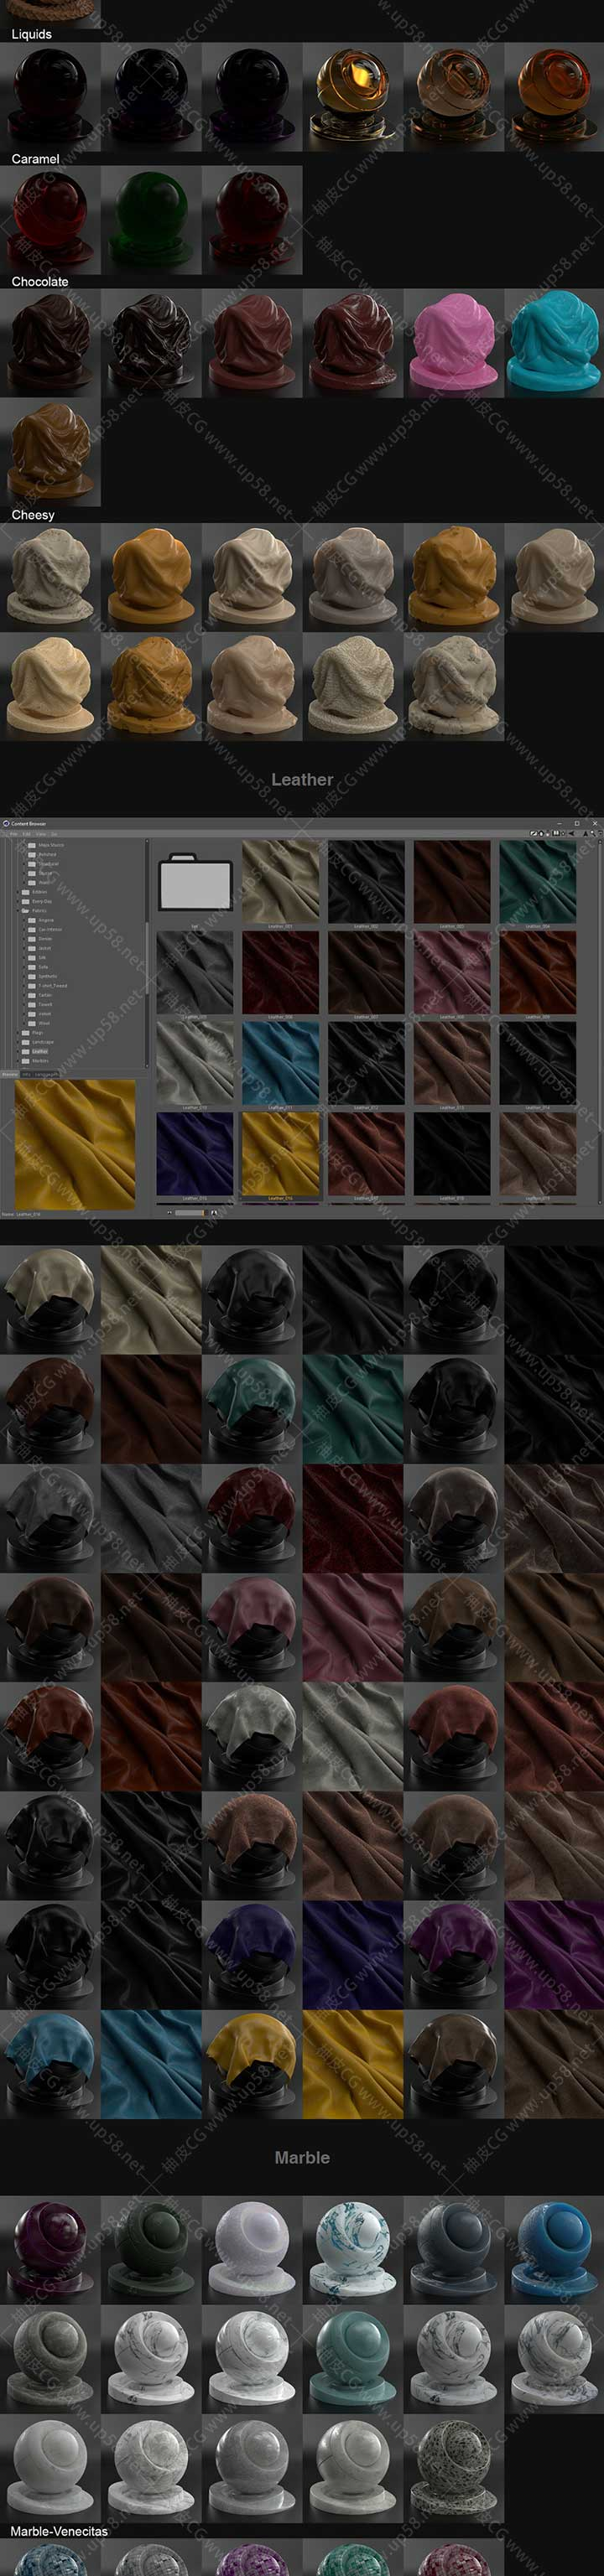 C4D Redshift金属皮革玻璃木材水泥大理石织物漆砖墙材质球预设库